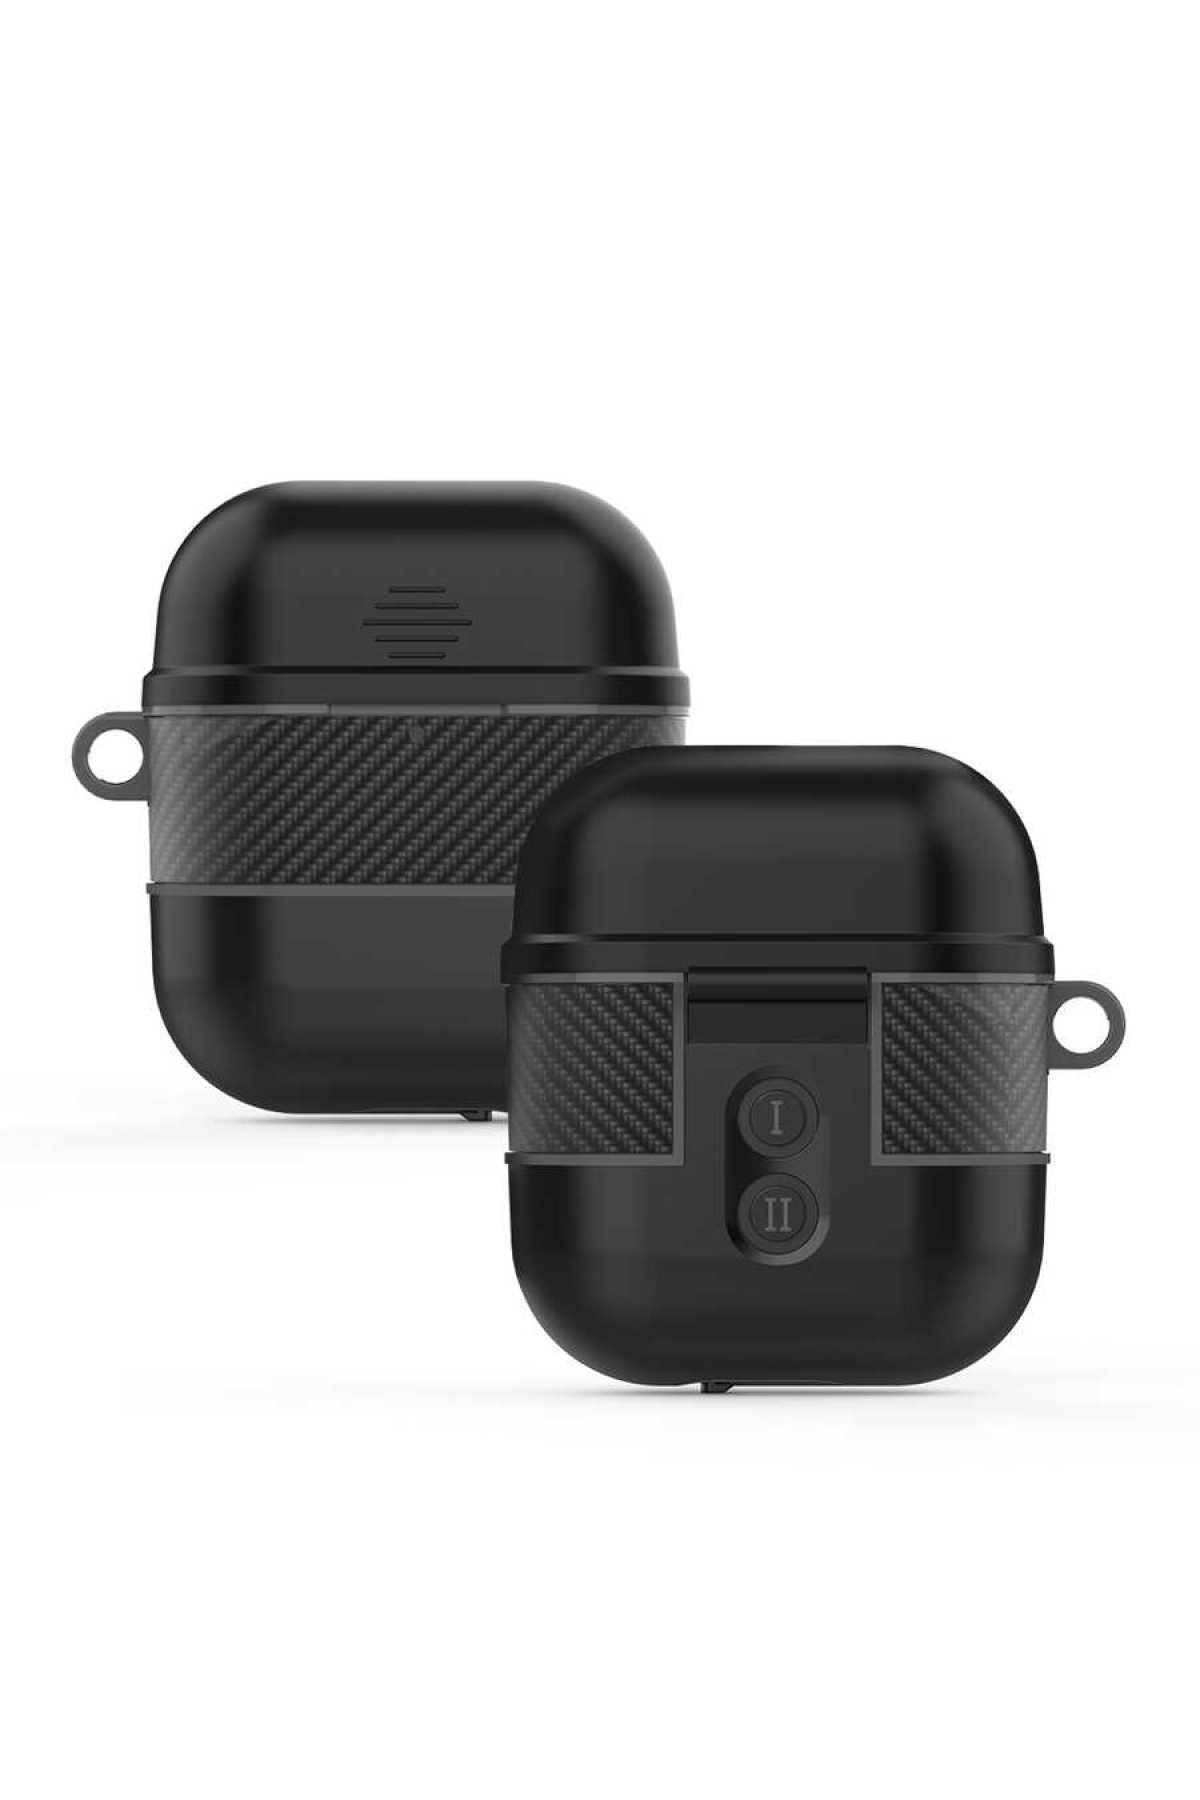 zore Apple Airpods Kılıf Airbag 16 Zırh Su Geçirmez Askılı Şarj Kutusu Koruyucu 2